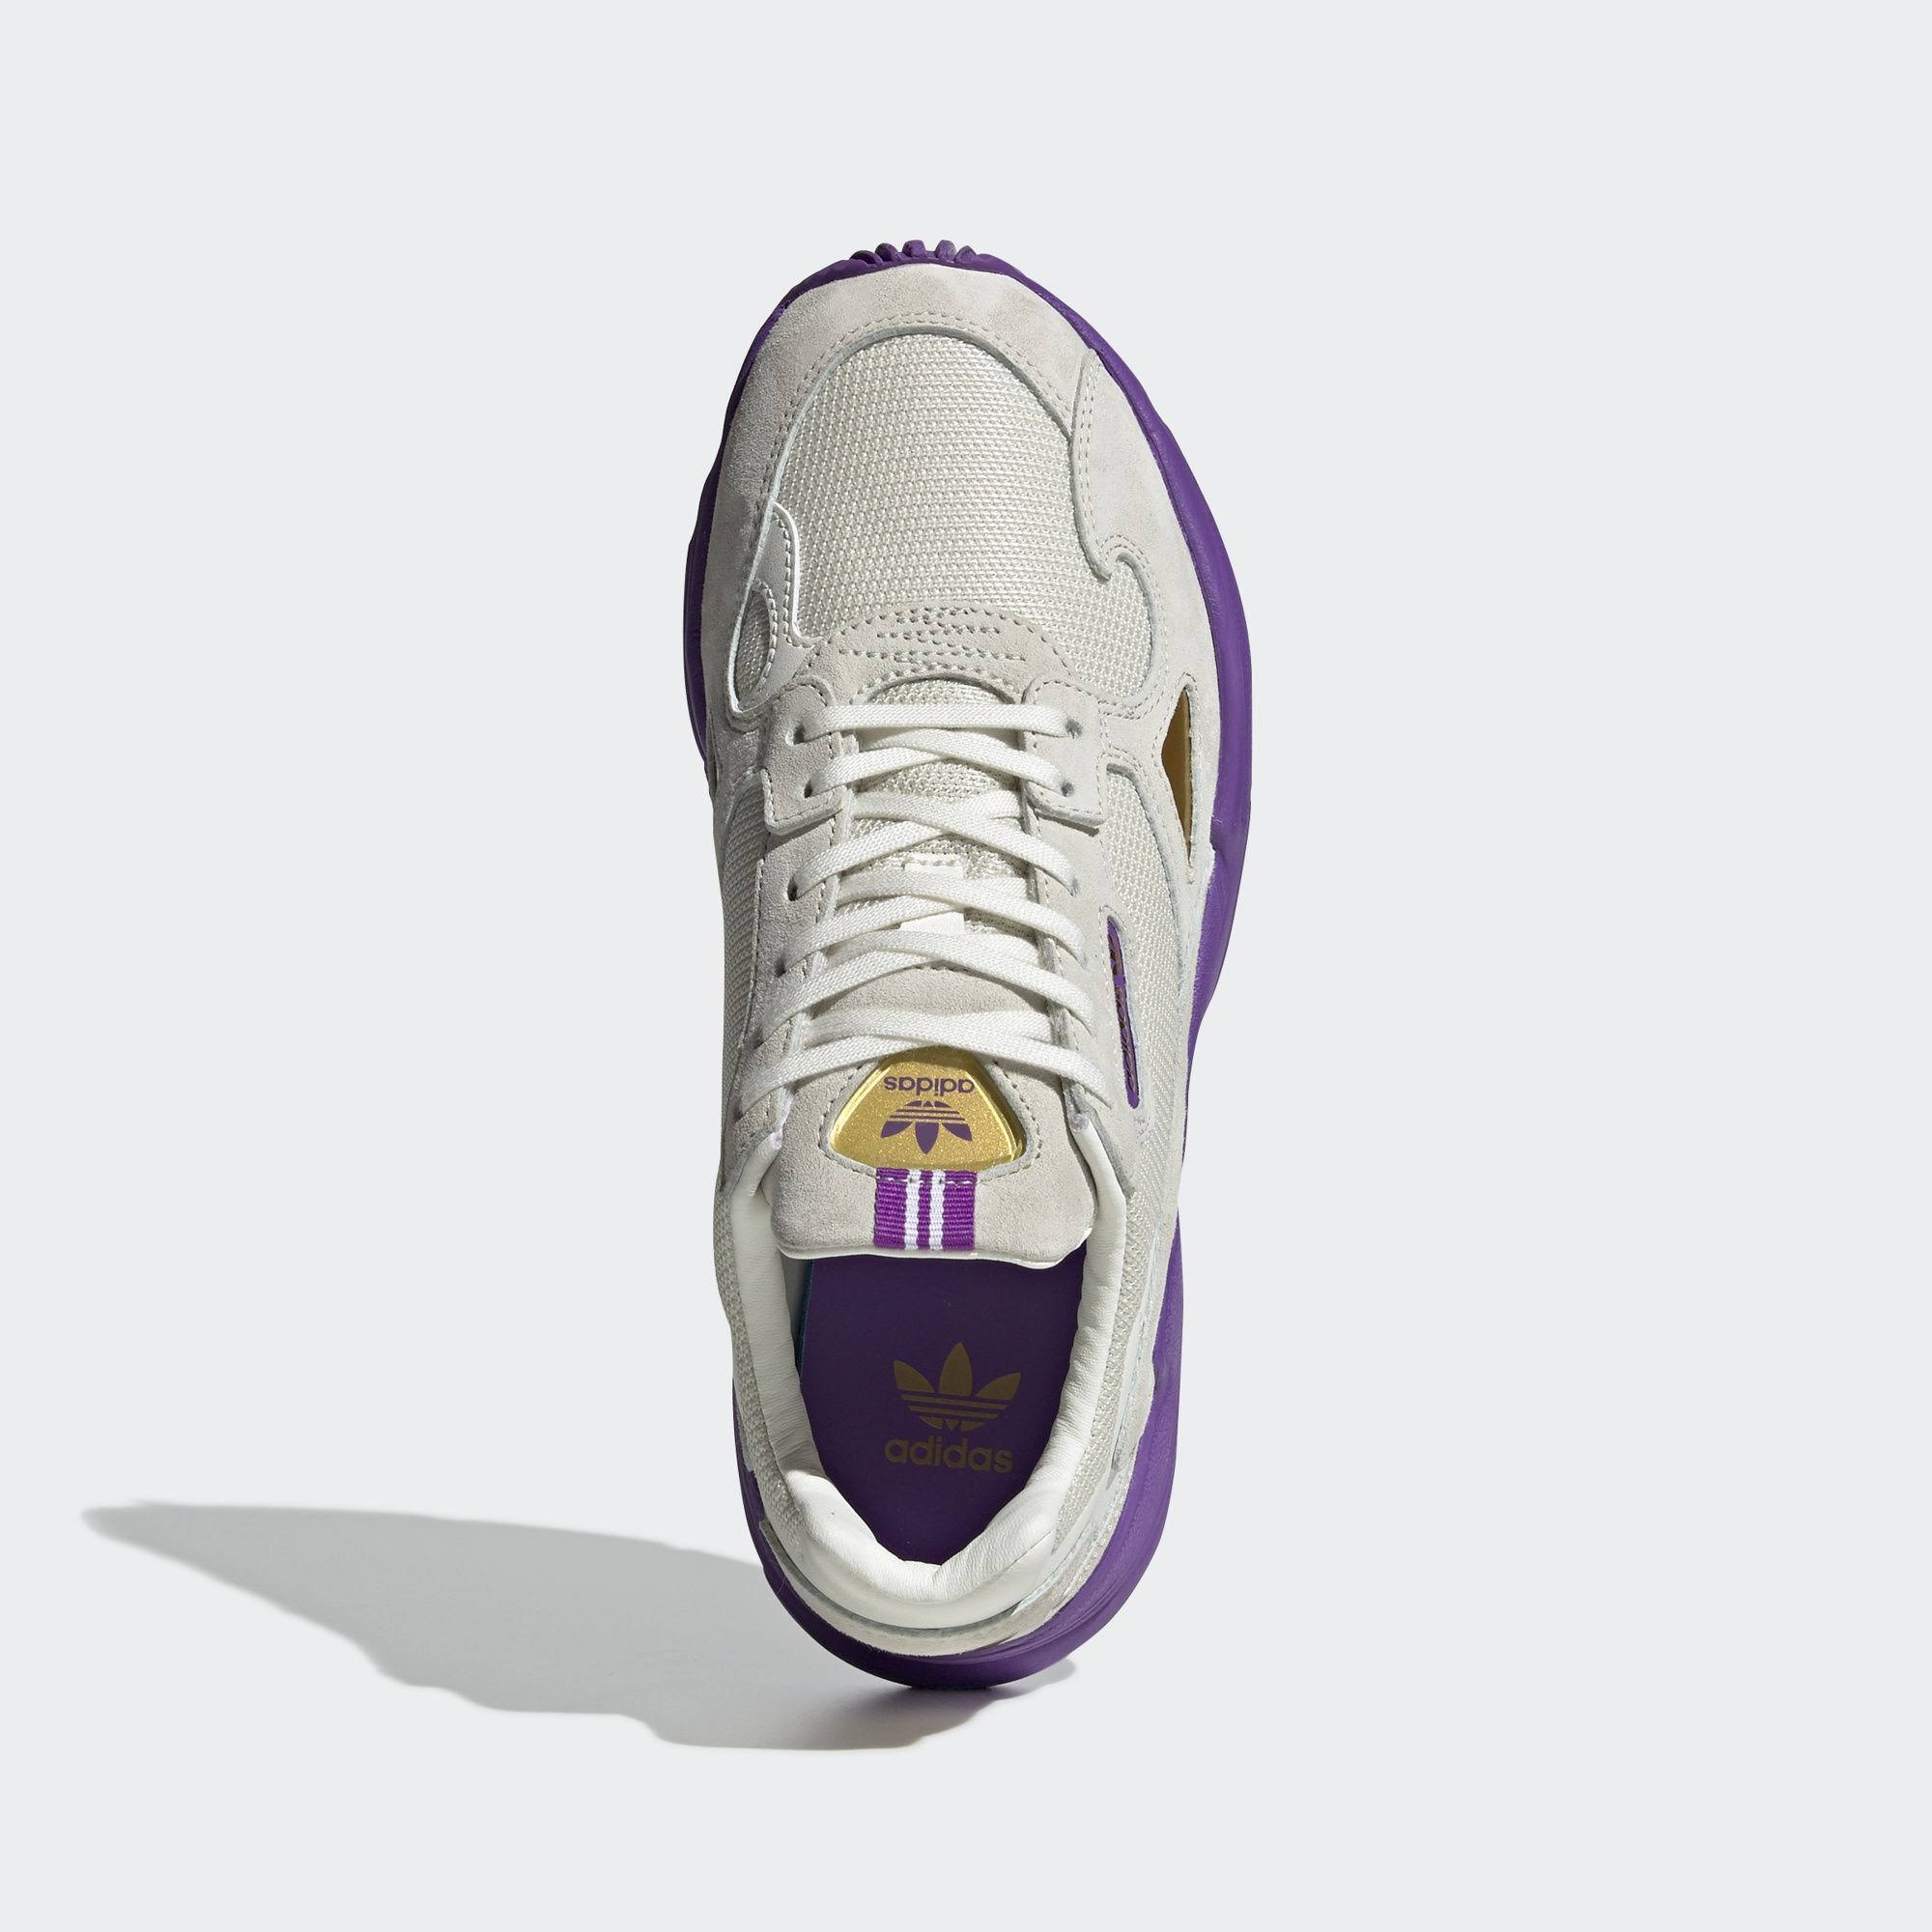 Purple Tfl Falcon Adidas Metallic White Gold Elizabeth OFCqvwx